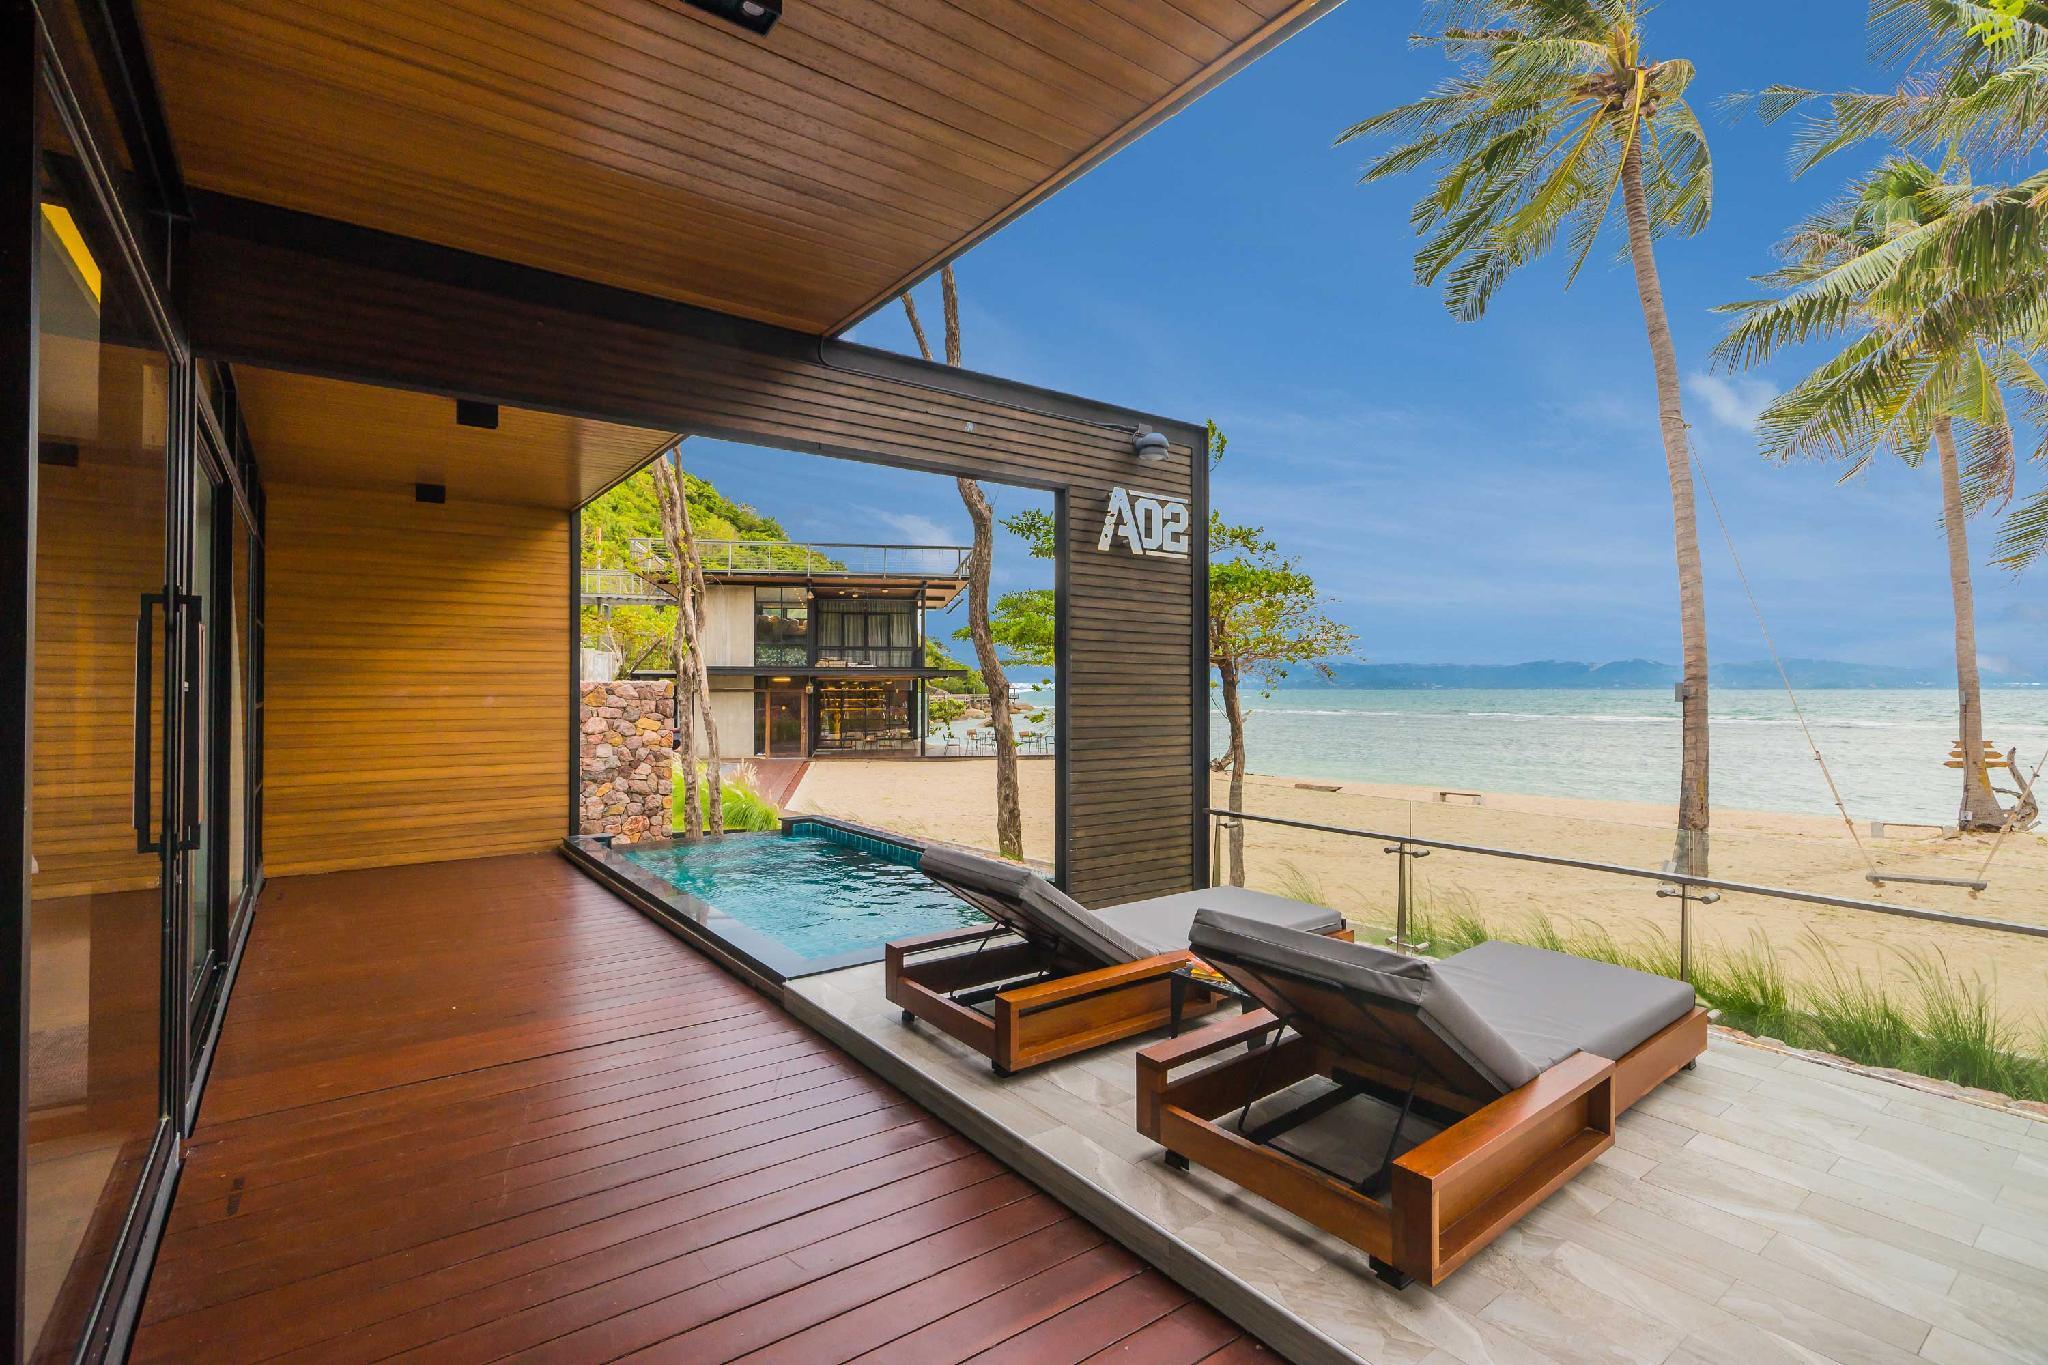 The Cabin Beach Resort